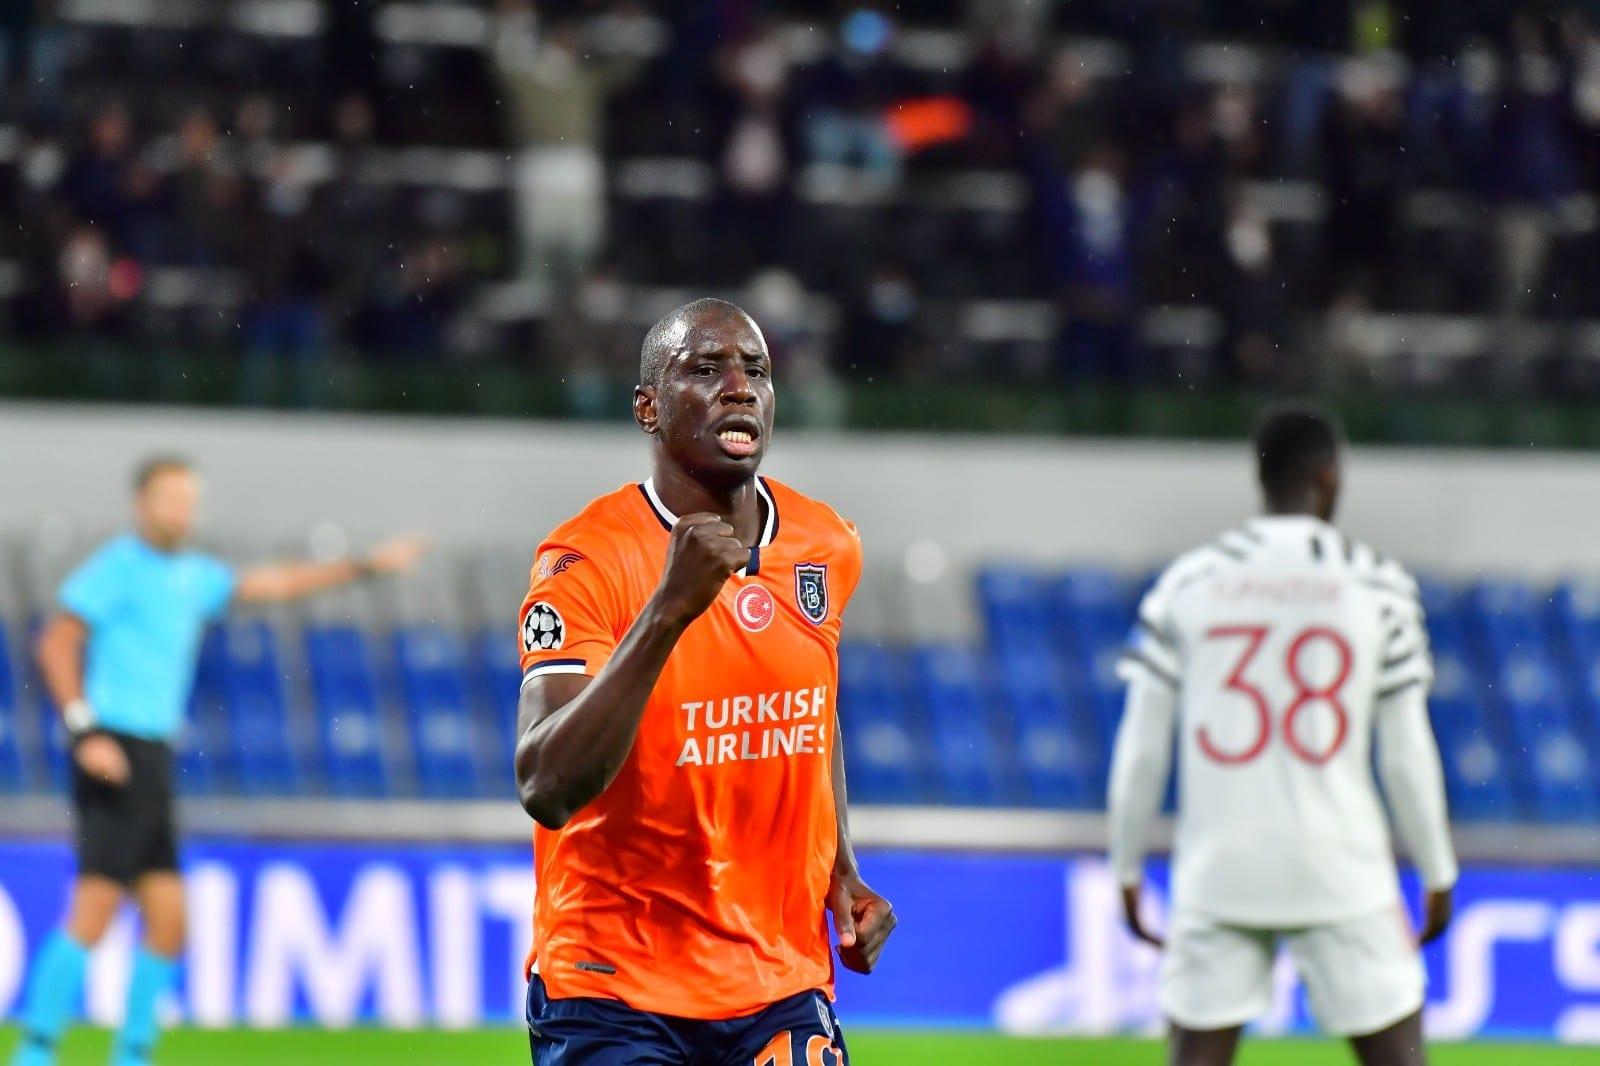 Ldc : Basaksehir surprend Man United, Demba Ba buteur !